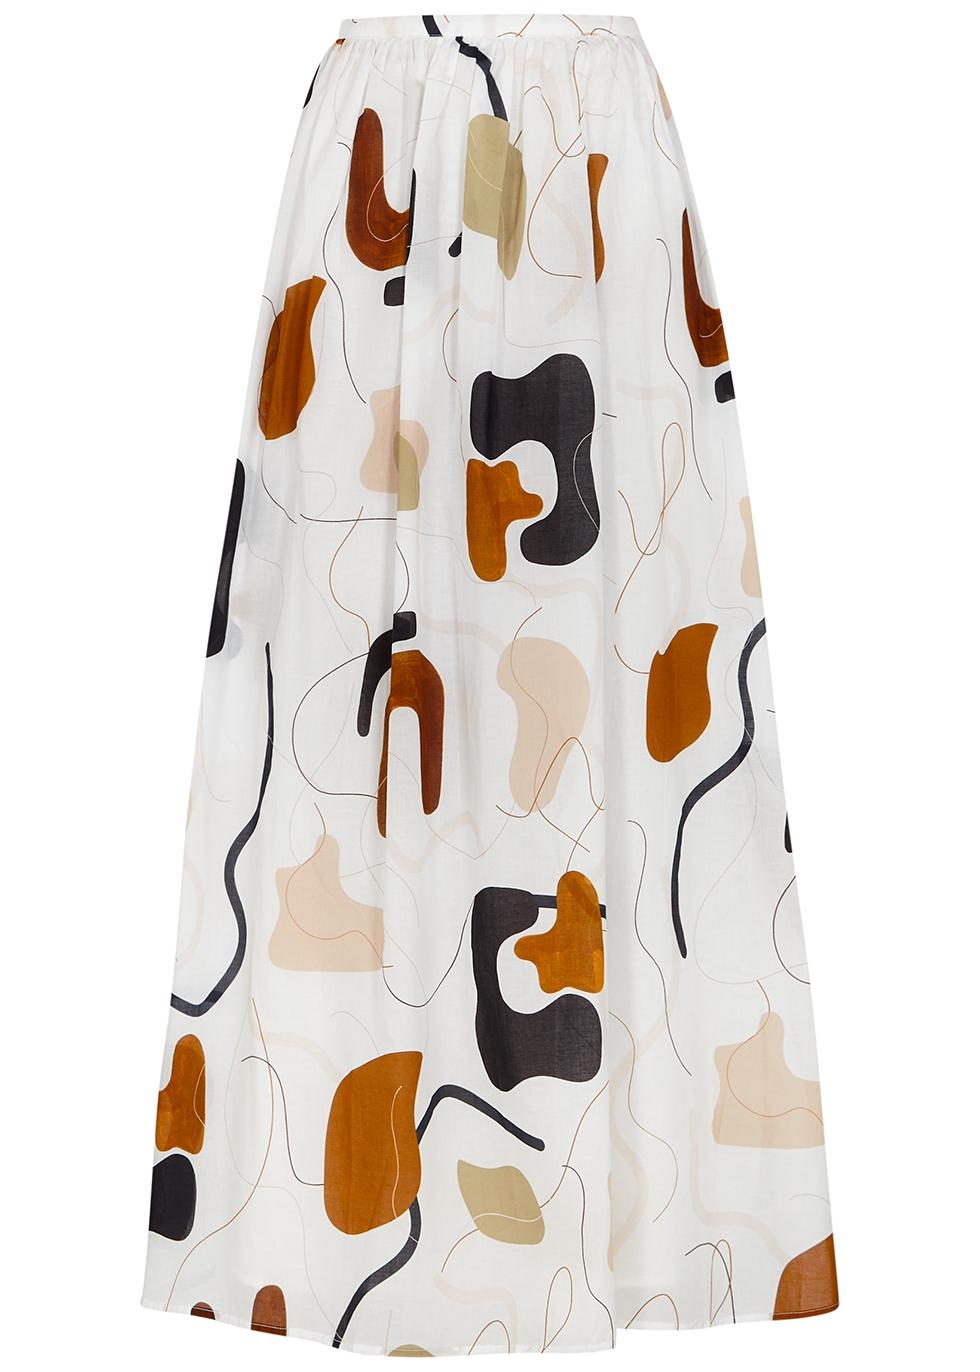 Rae printed cotton maxi skirt